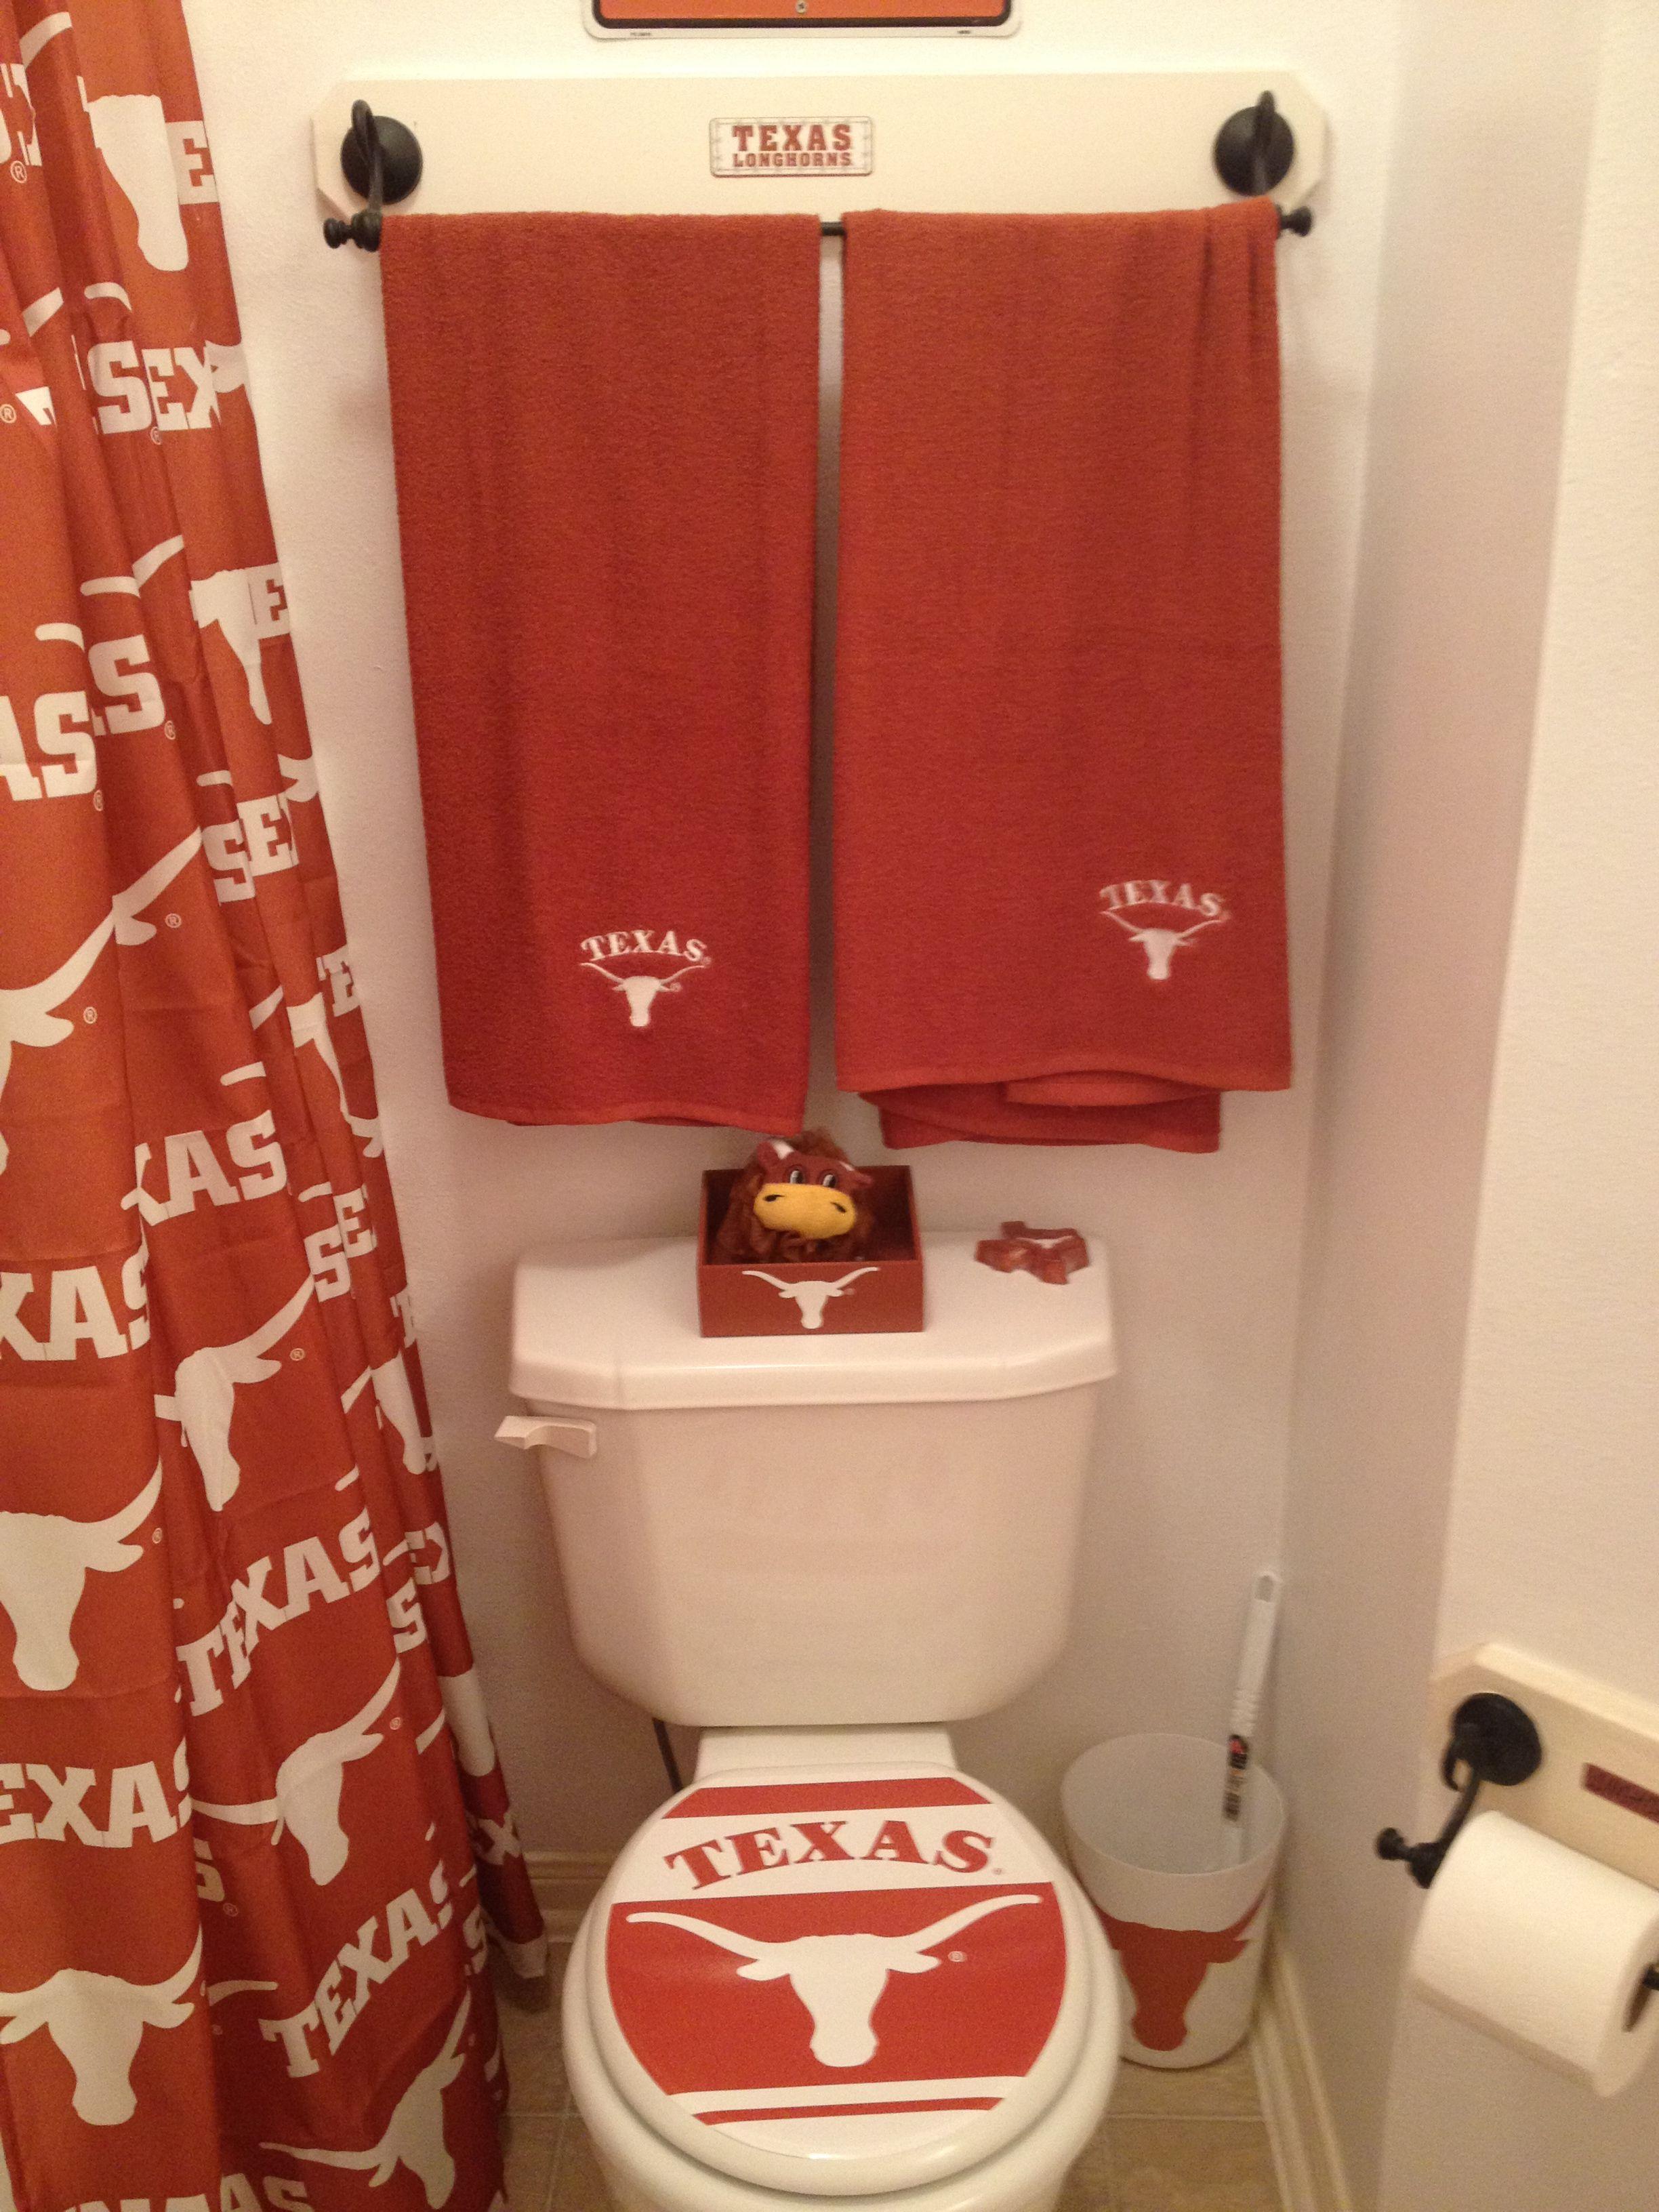 Brad S Bathroom My V Day Gift To Him Bathroom Longhorn Brads Texas longhorn bathroom decor